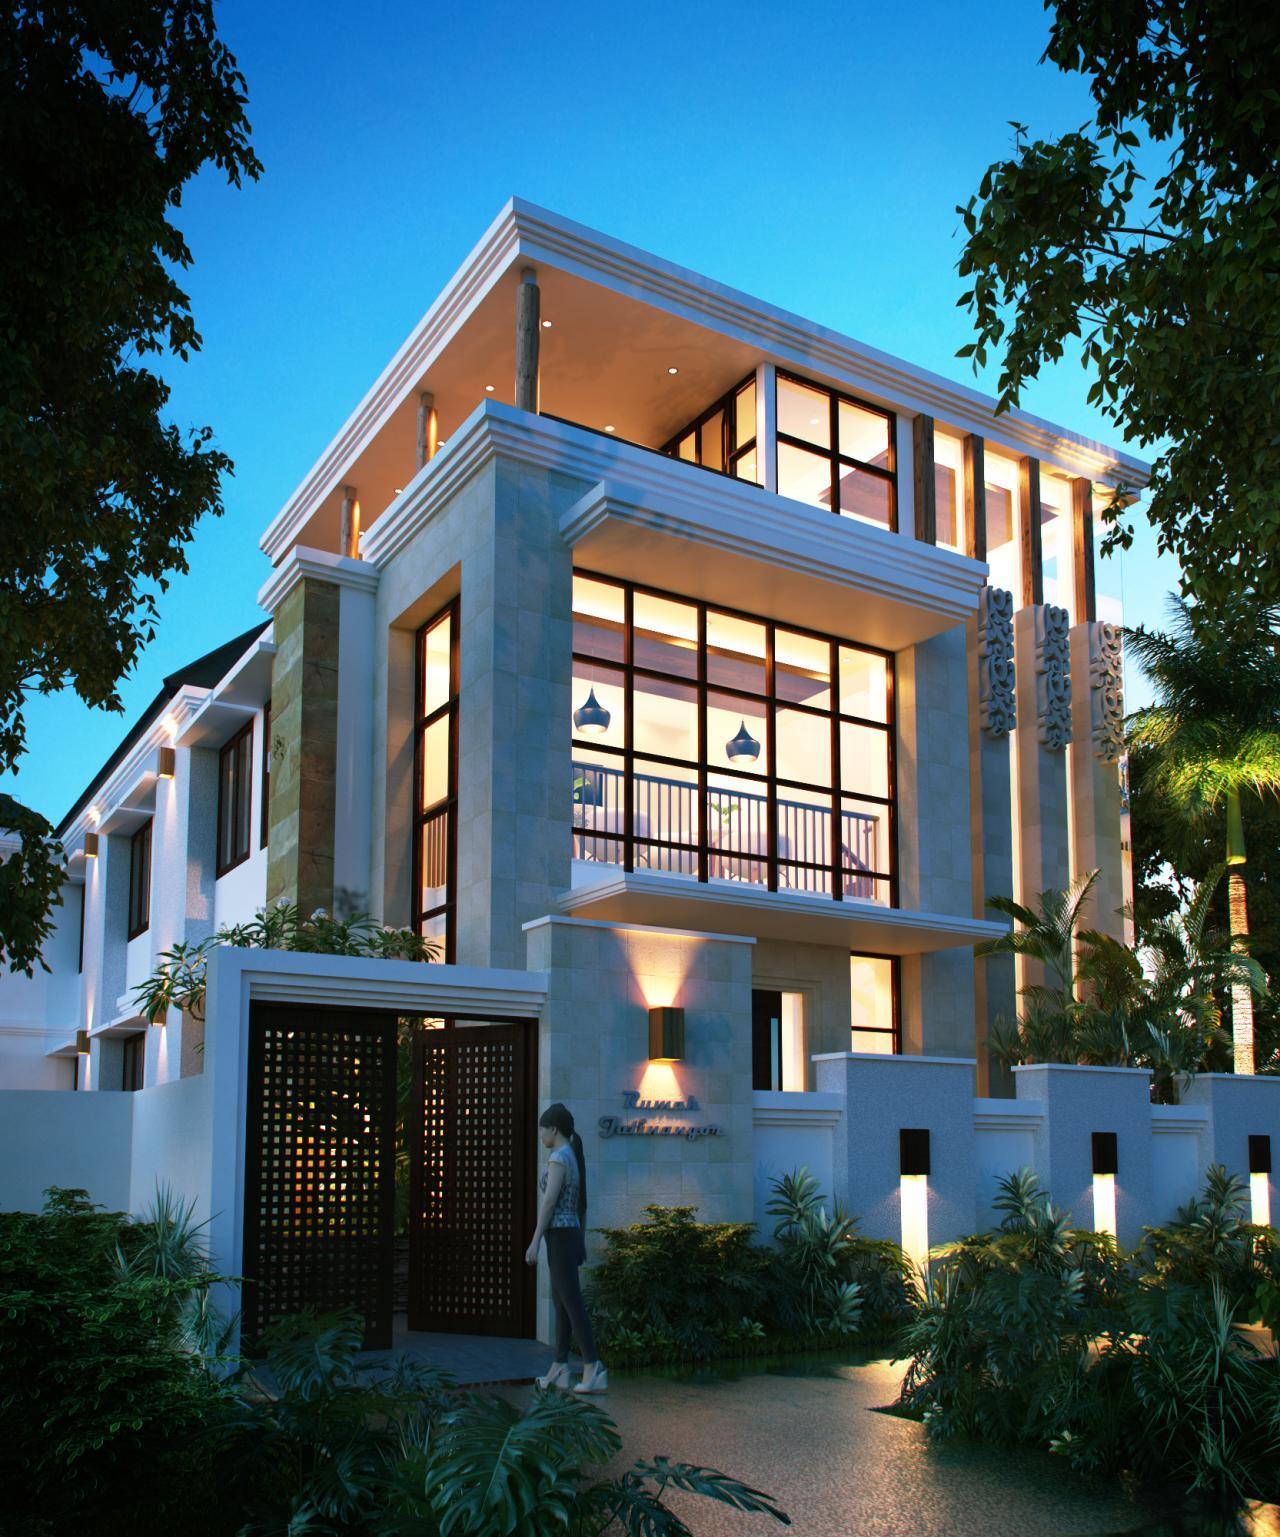 Desain Rumah Kos Modern 3 Lantai Bapak Saichu Di Bandung